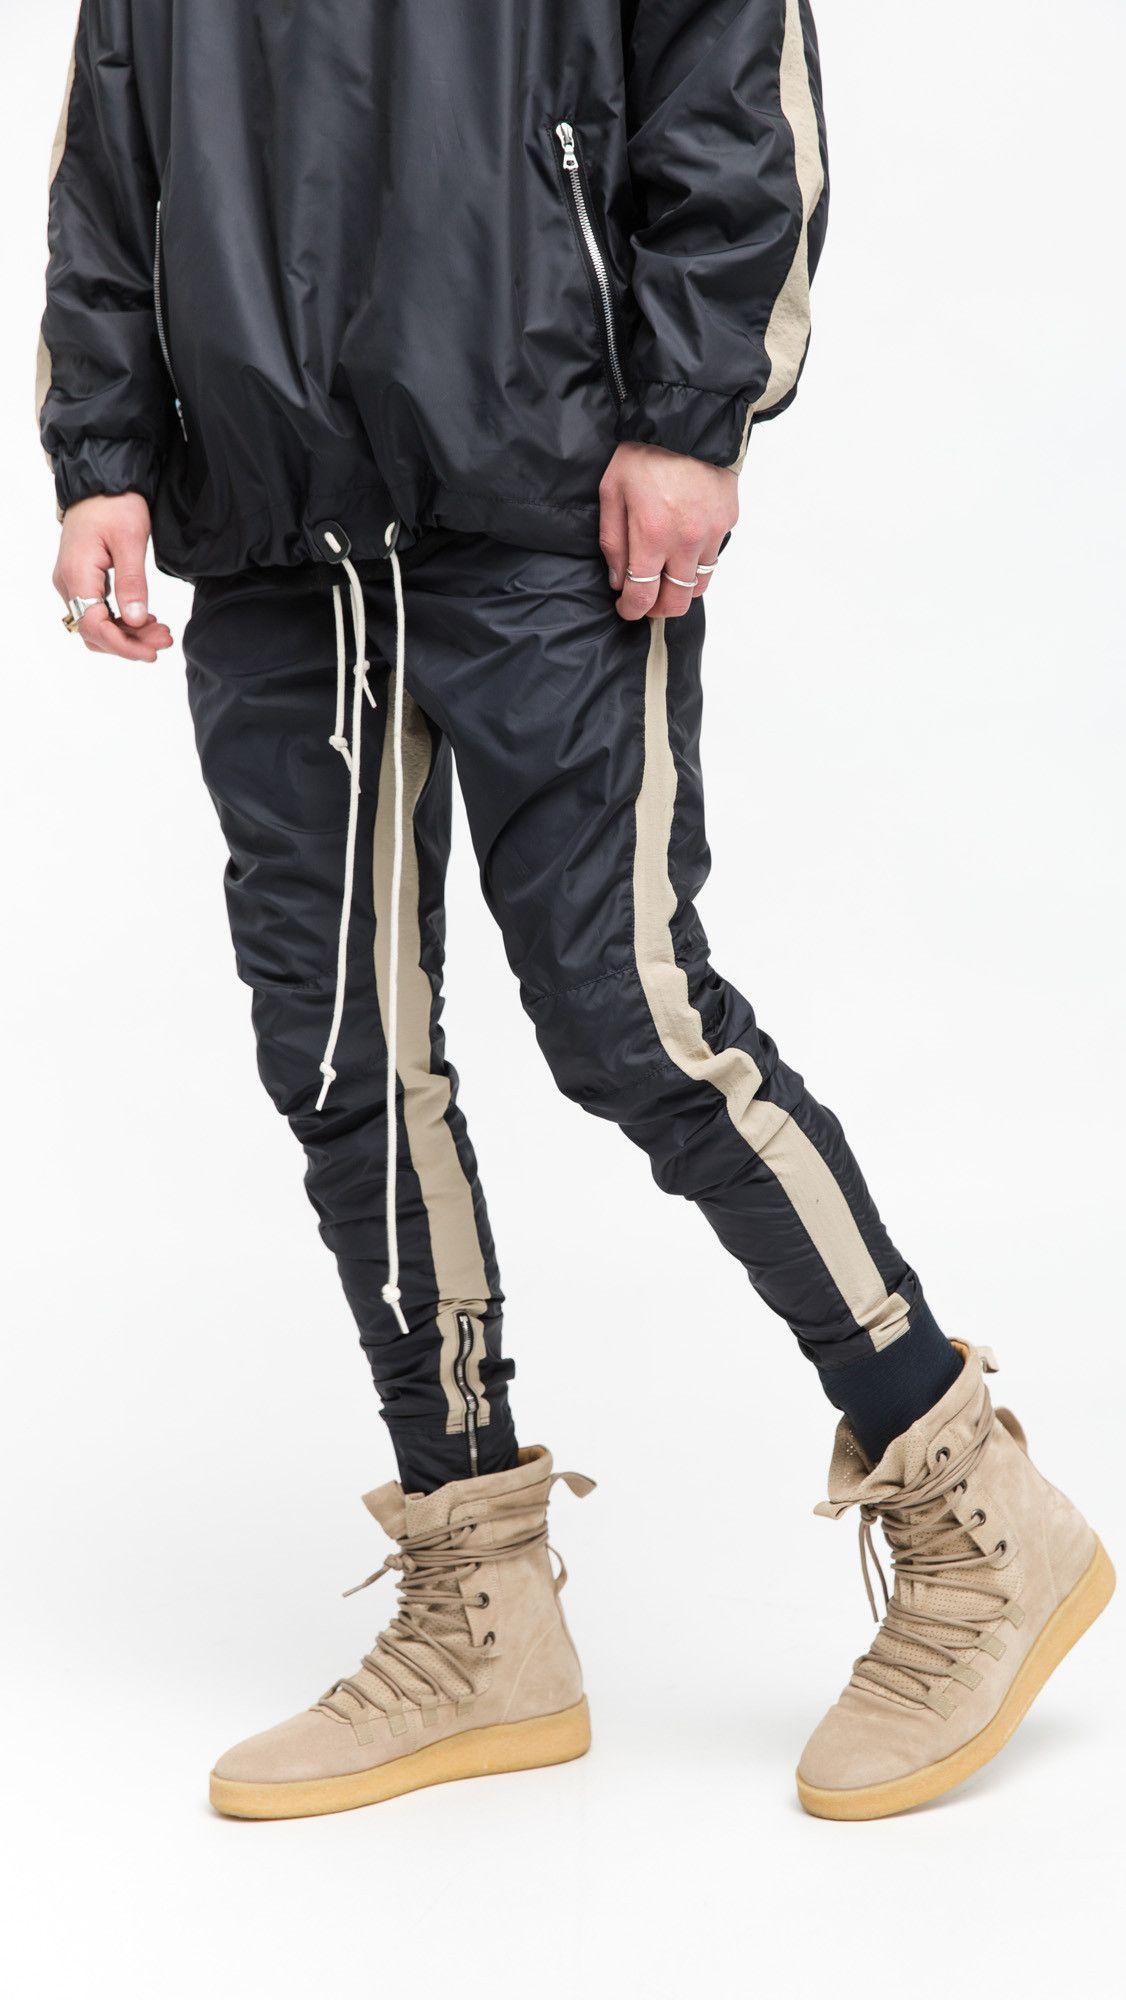 Compre 2018 Nueva HIPHOP Kanye West Oversize Negro Cosido Fondos Cremallera  Lateral Pantalones Hip Hop Moda Ropa Casual Polainas Pantalones XXL A   32.49 Del ... a60426f1fa3